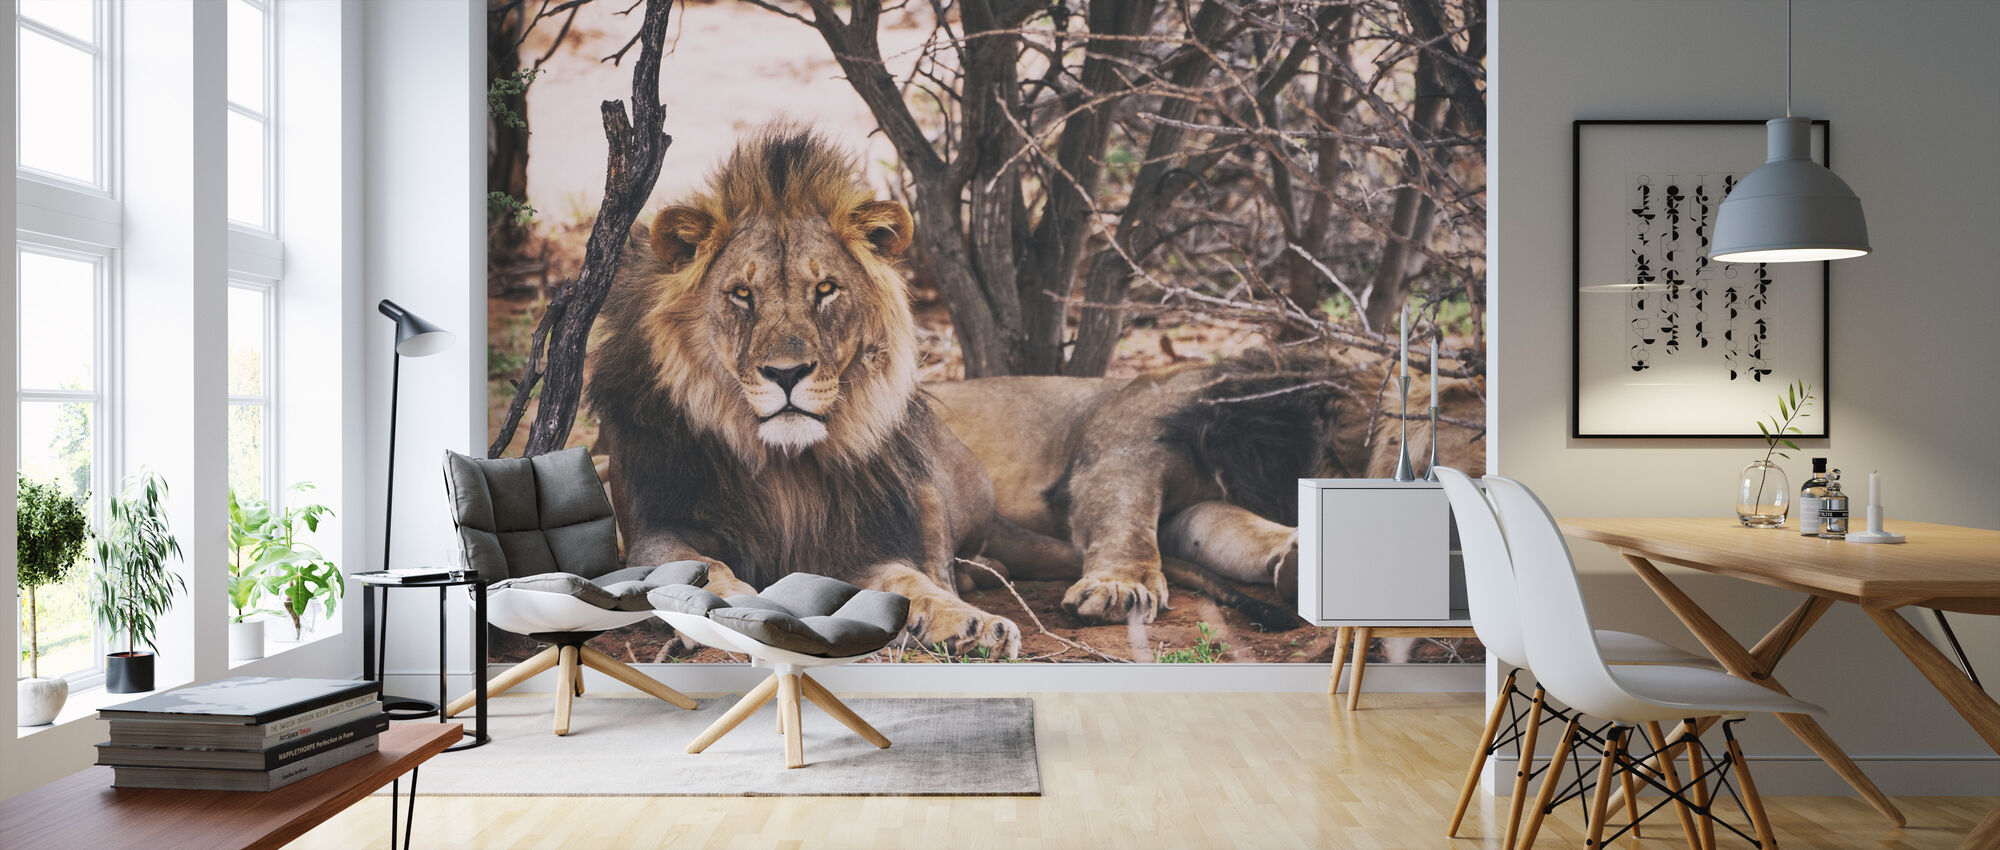 Lions under ett träd - Tapet - Vardagsrum